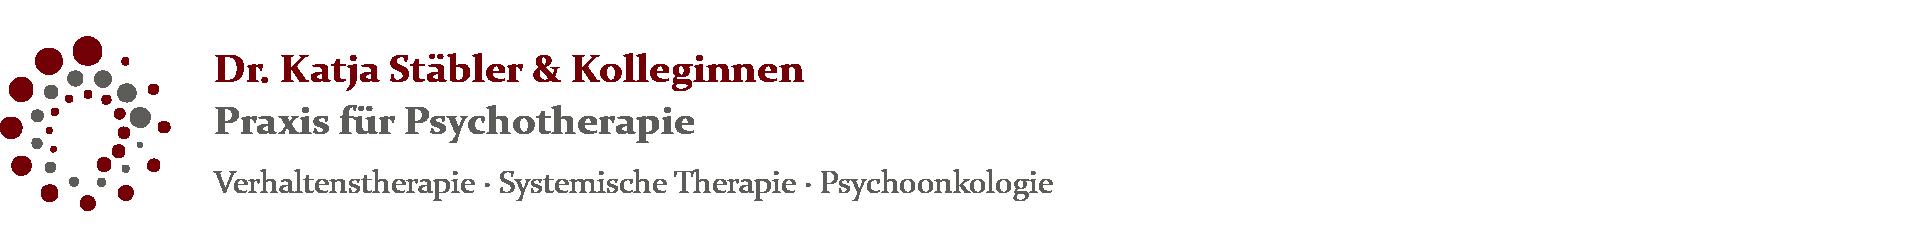 Dr. Katja Stäbler Logo